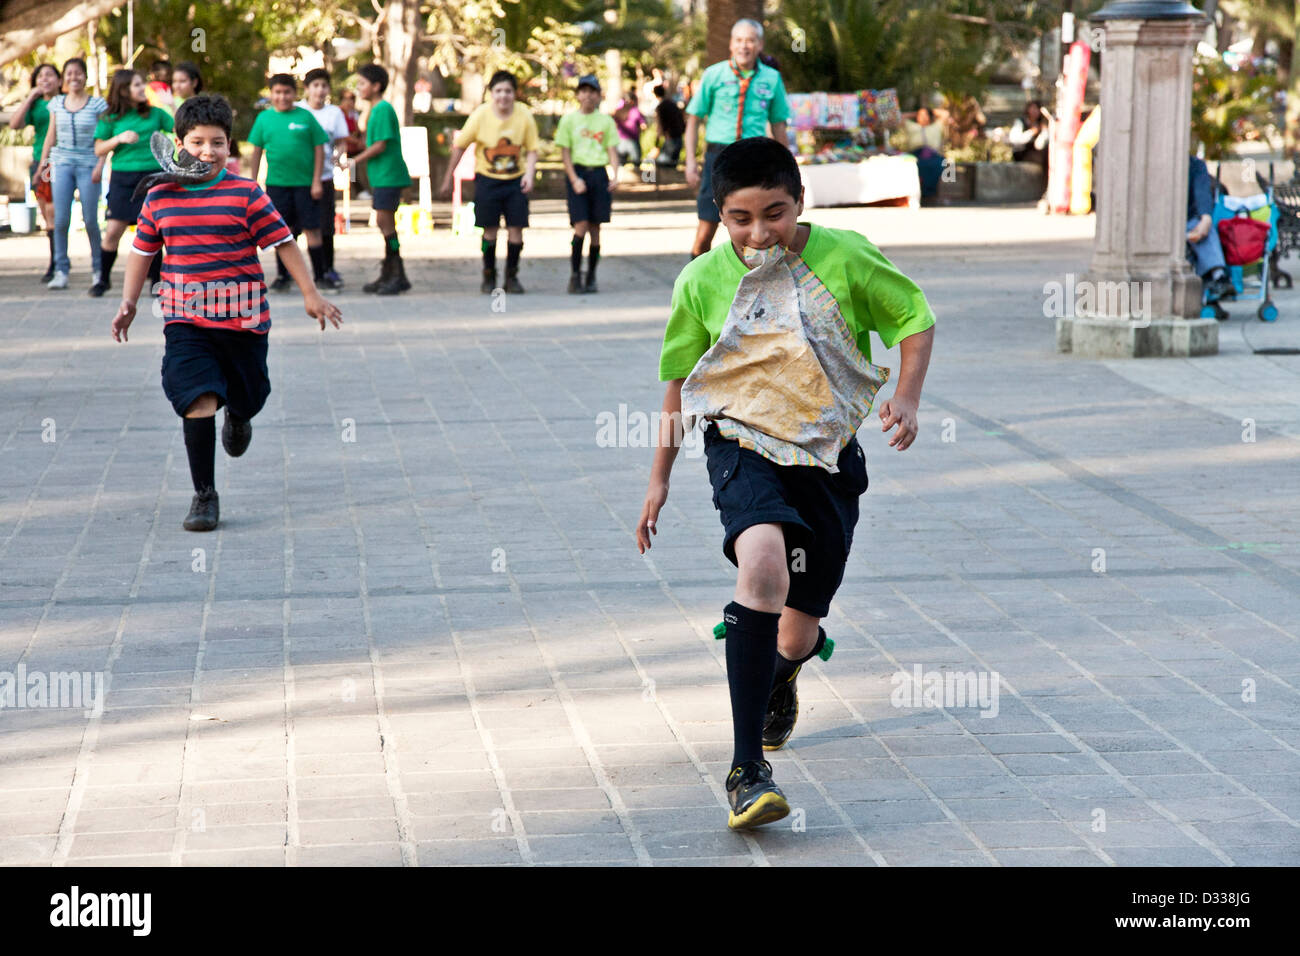 smiling tween boy scouts with handkerchiefs in their mouths running in team relay race Llano park Oaxaca de Juarez - Stock Image